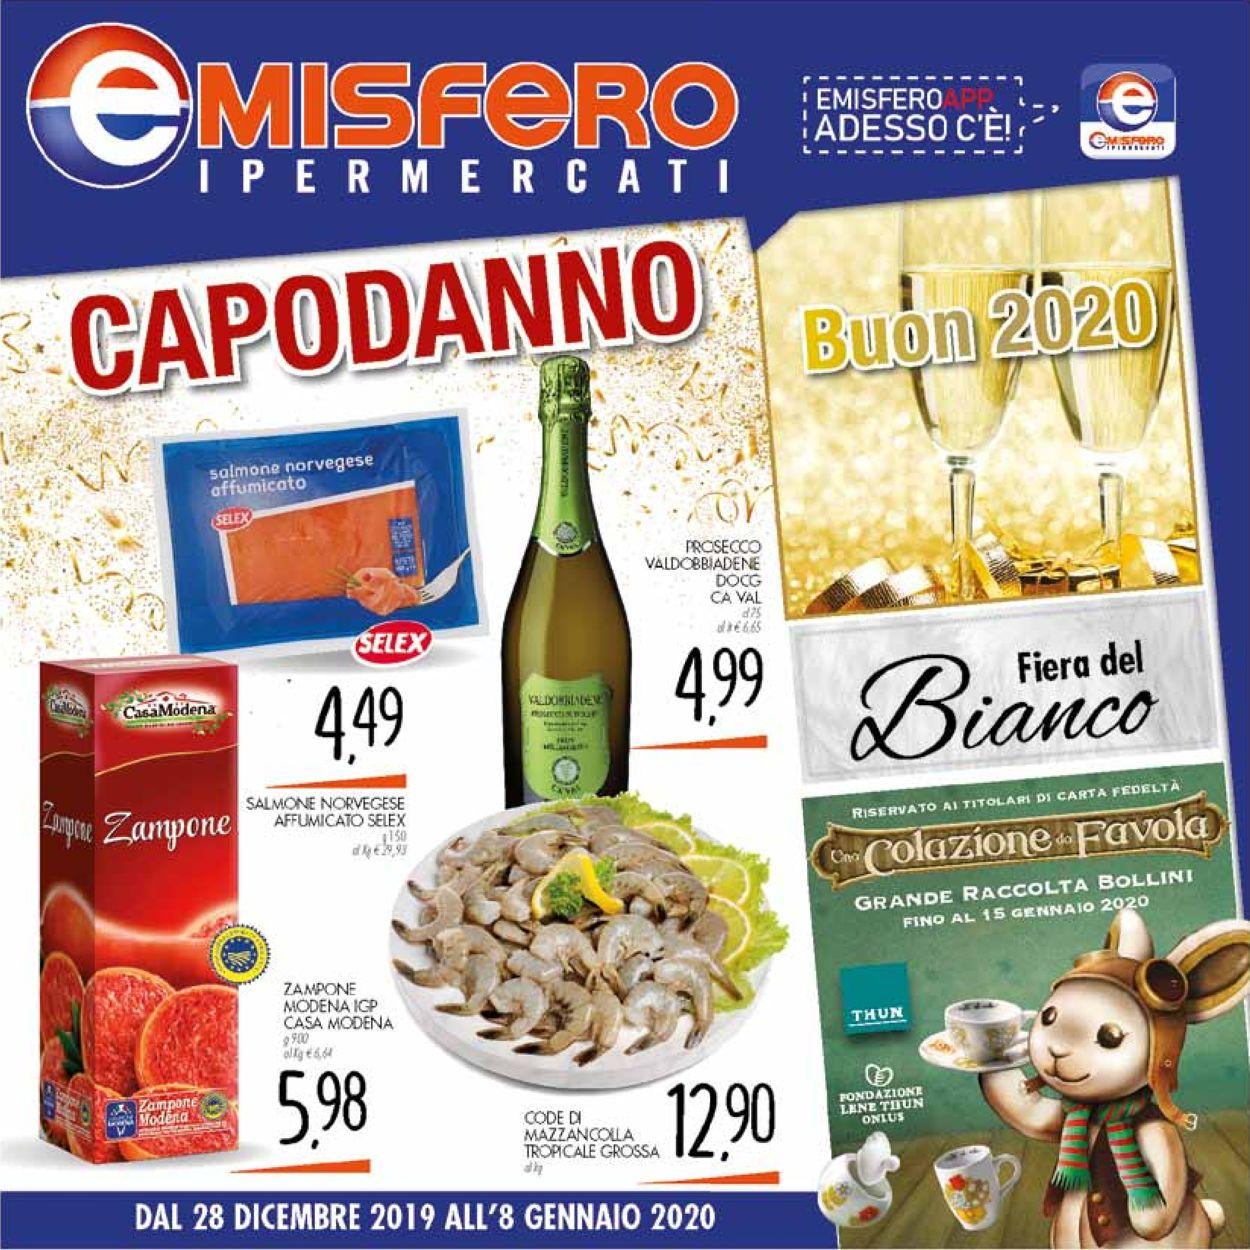 Volantino Emisfero - Offerte 28/12-08/01/2020